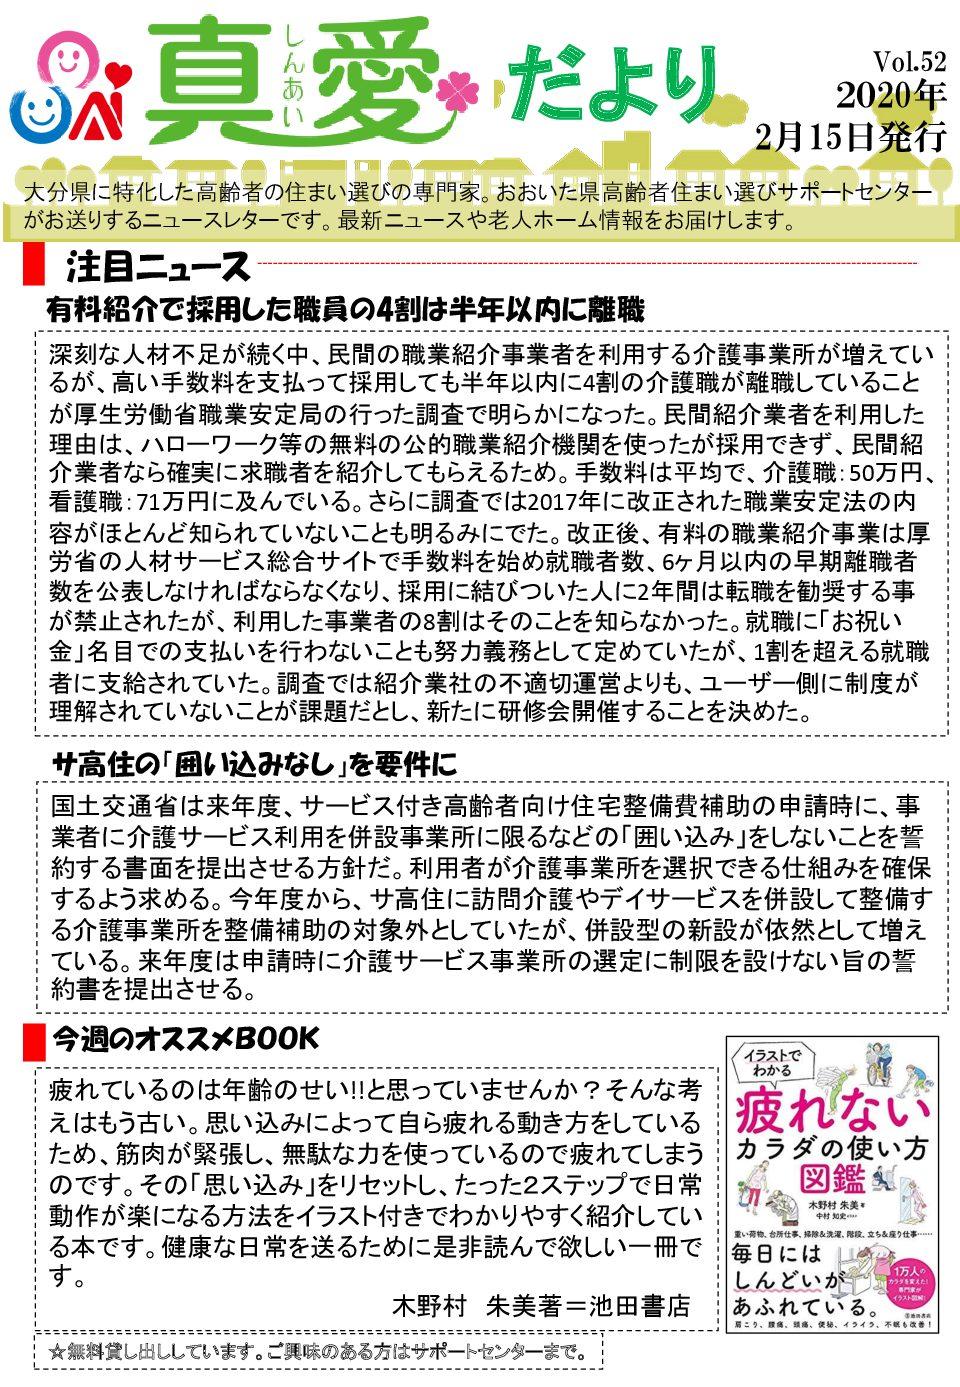 【Vol.52】 2020.02.15発行